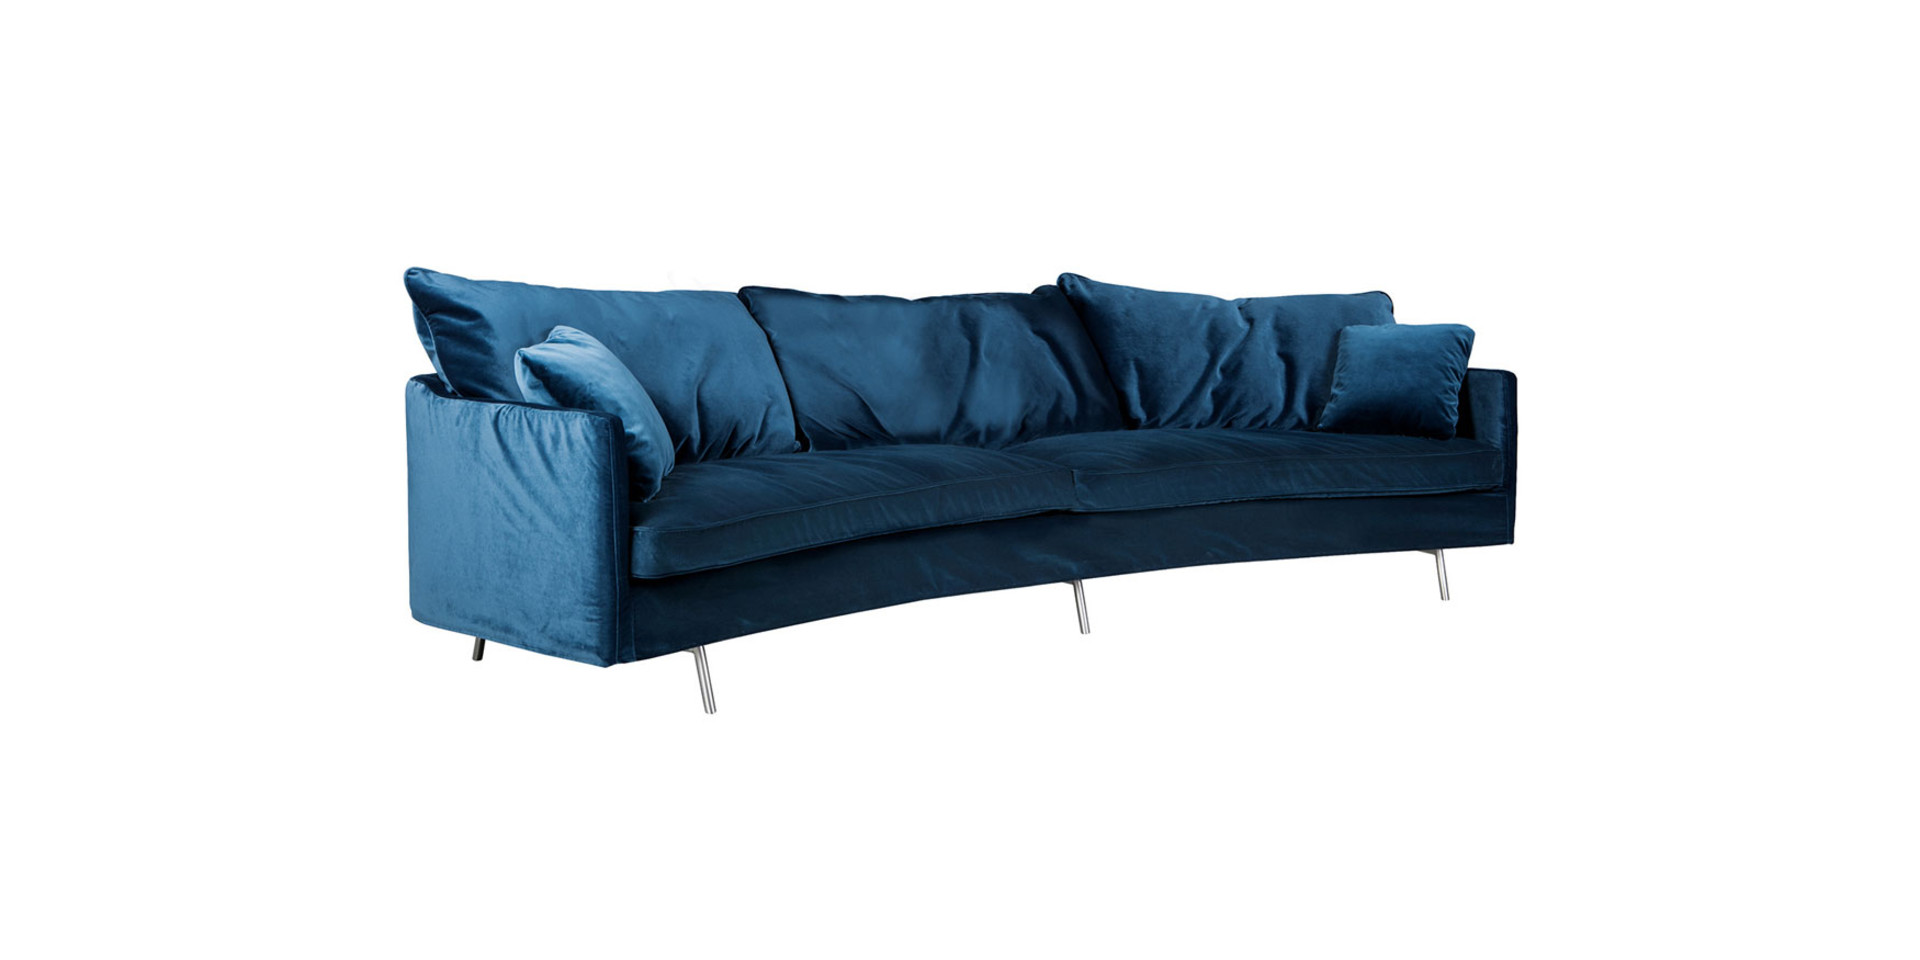 sits-julia-canape-4seater_round_classic_velvet11_dark_blue_2